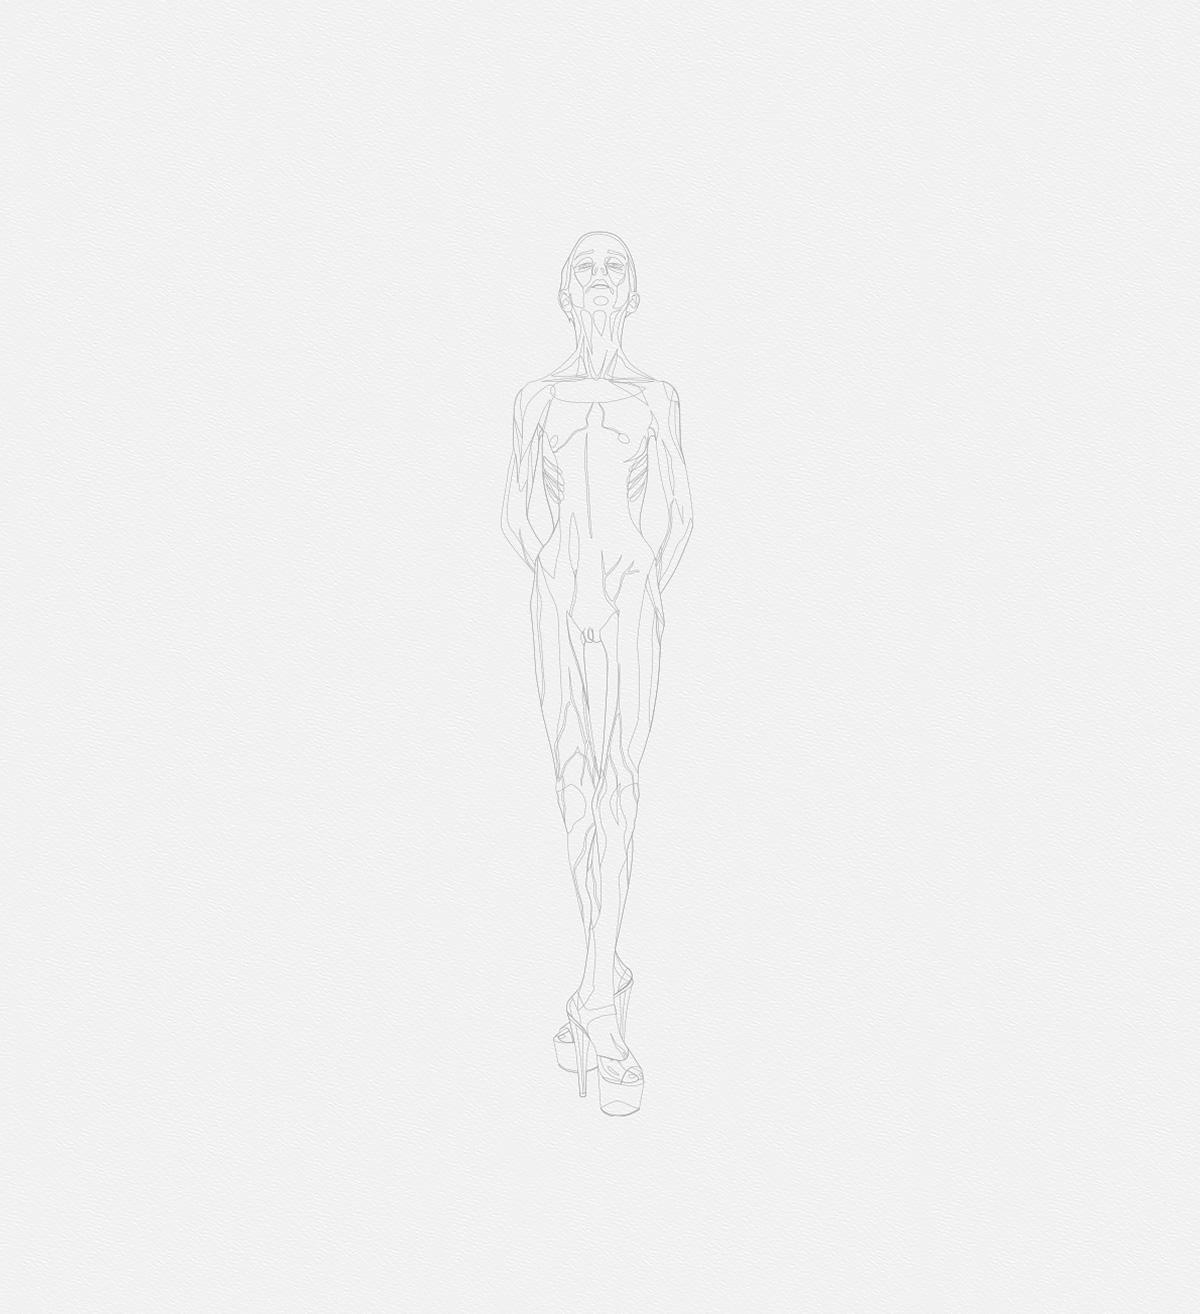 2016 la petite danseuse drawbot 001 full tty art - 2016 - La petite danseuse - Drawbot